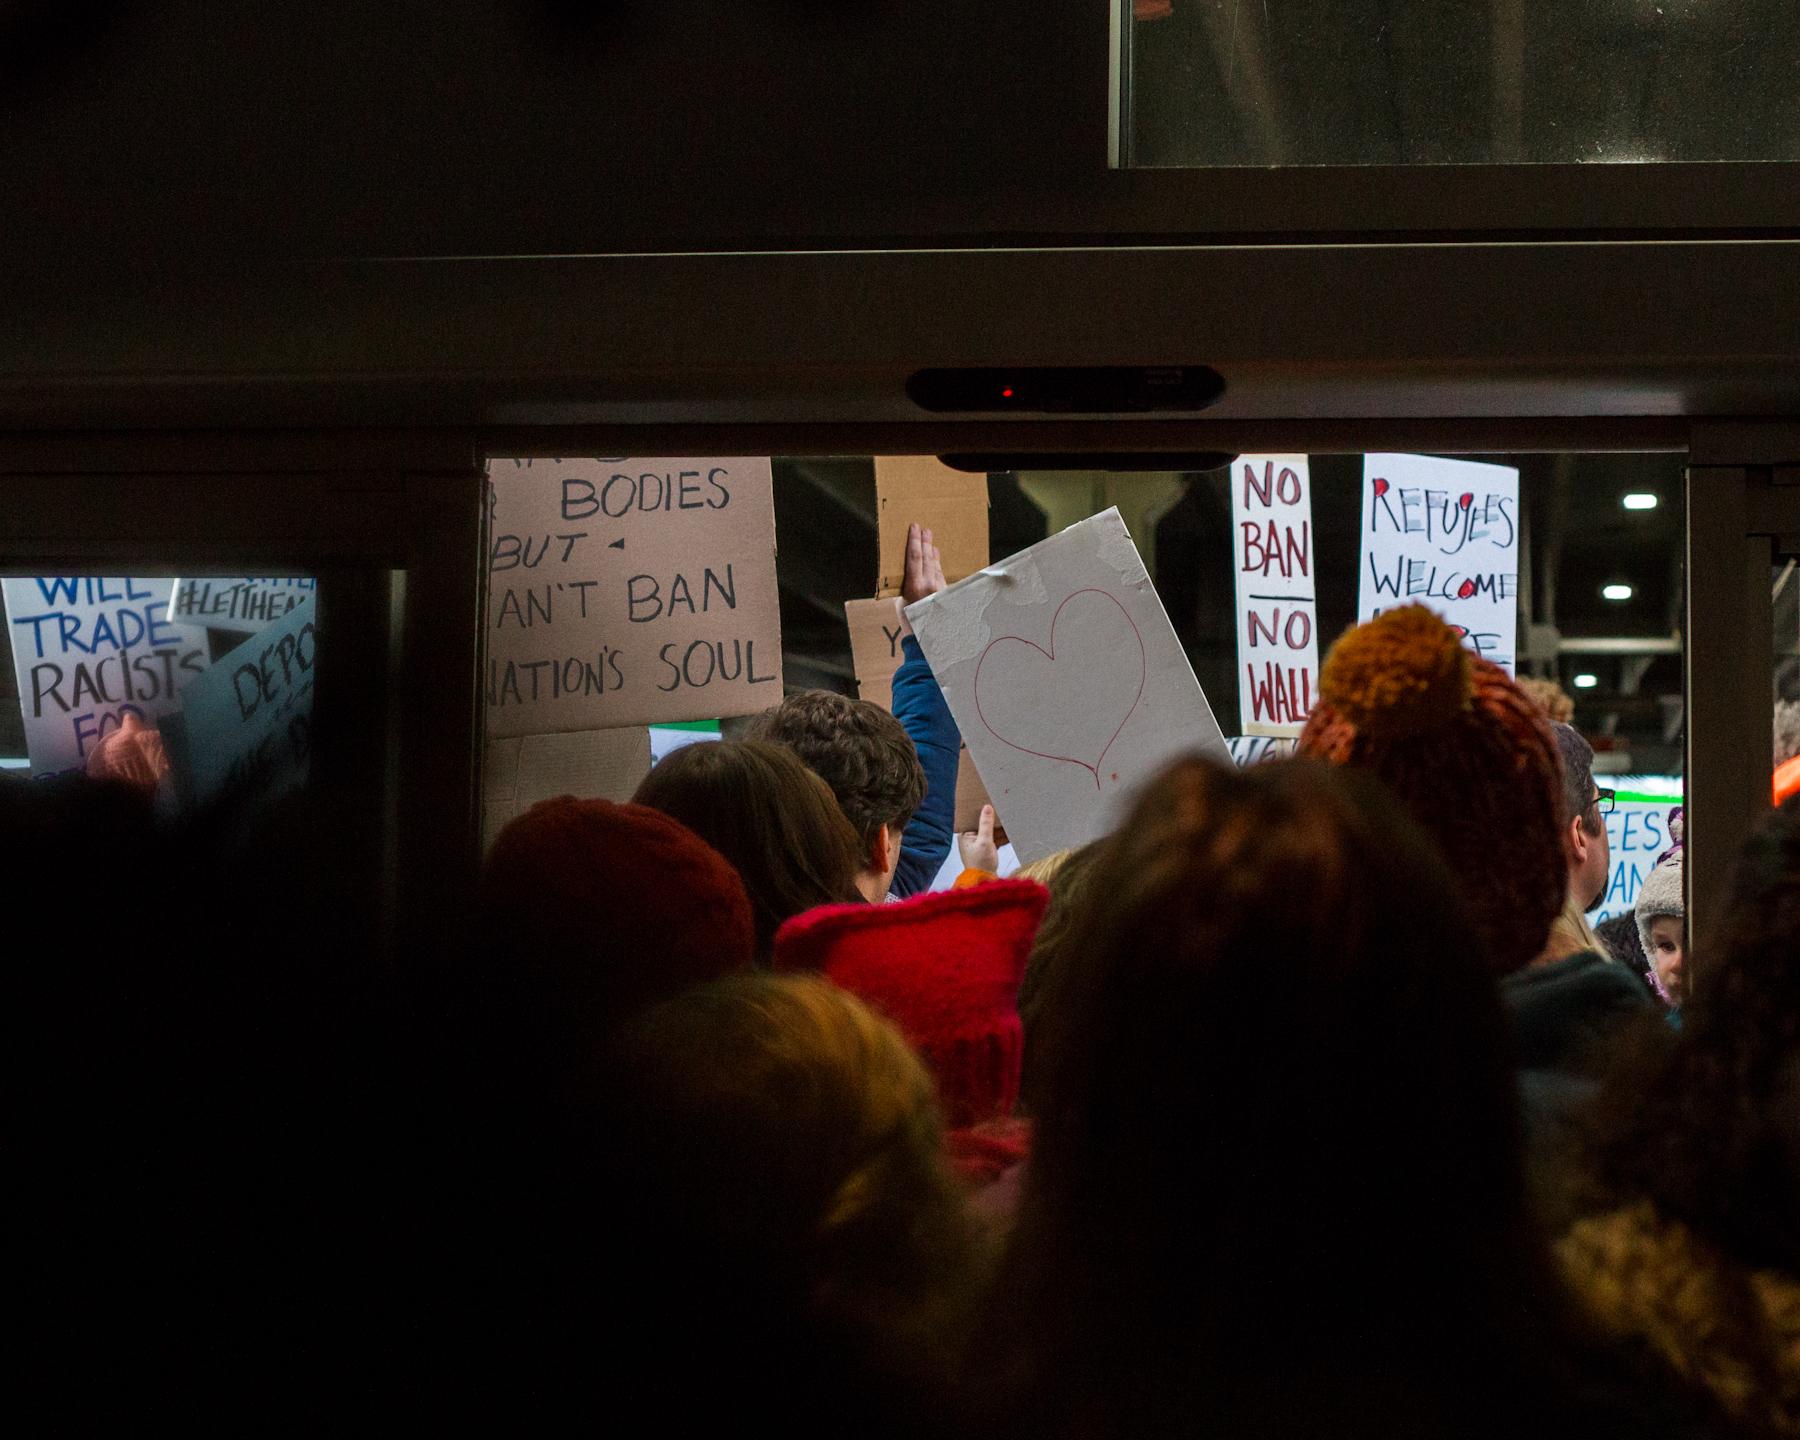 Protesting the Muslim ban at PHL, 1/29/17